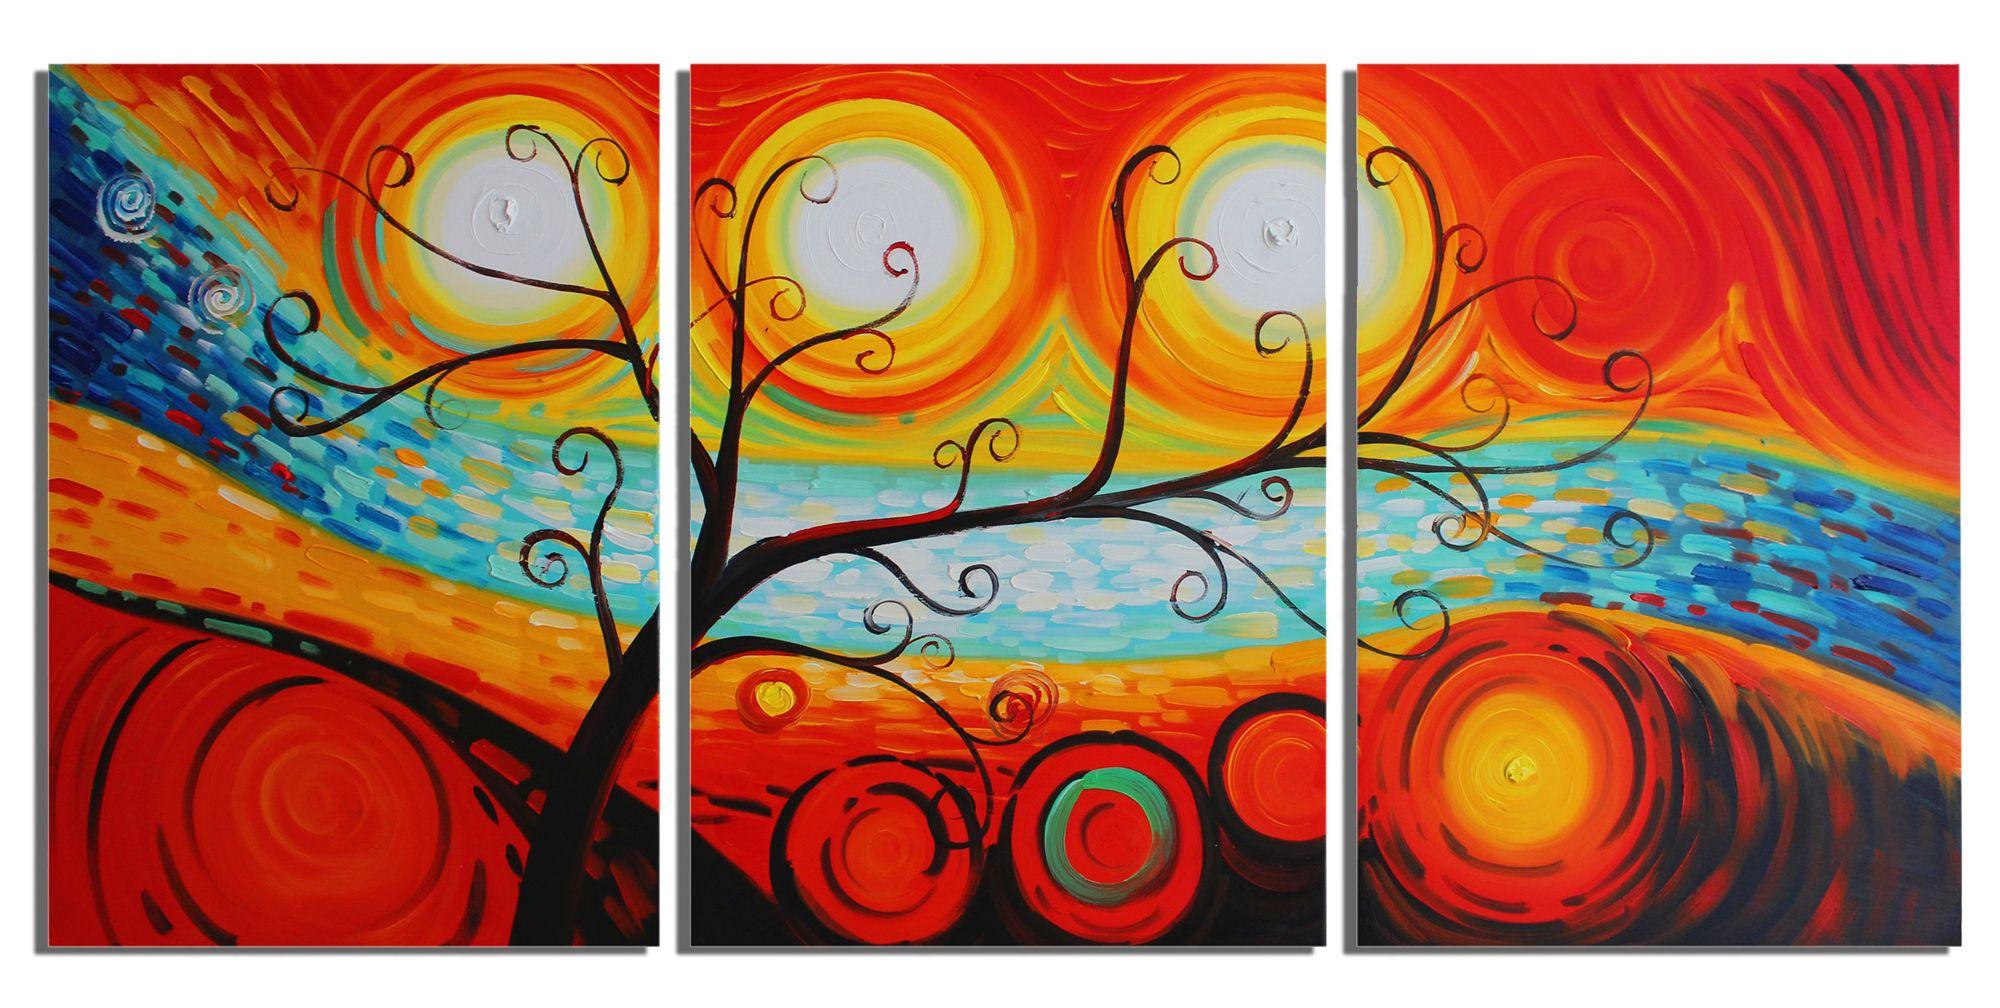 Lovely Compre Rainbow Tree Hand Paint Pintura A Óleo 3 Painel Canvas Art Decoração  Da Casa Modern Abstract Life Tree Painting De Sunshine1172, $43.08 |  Pt.Dhgate.